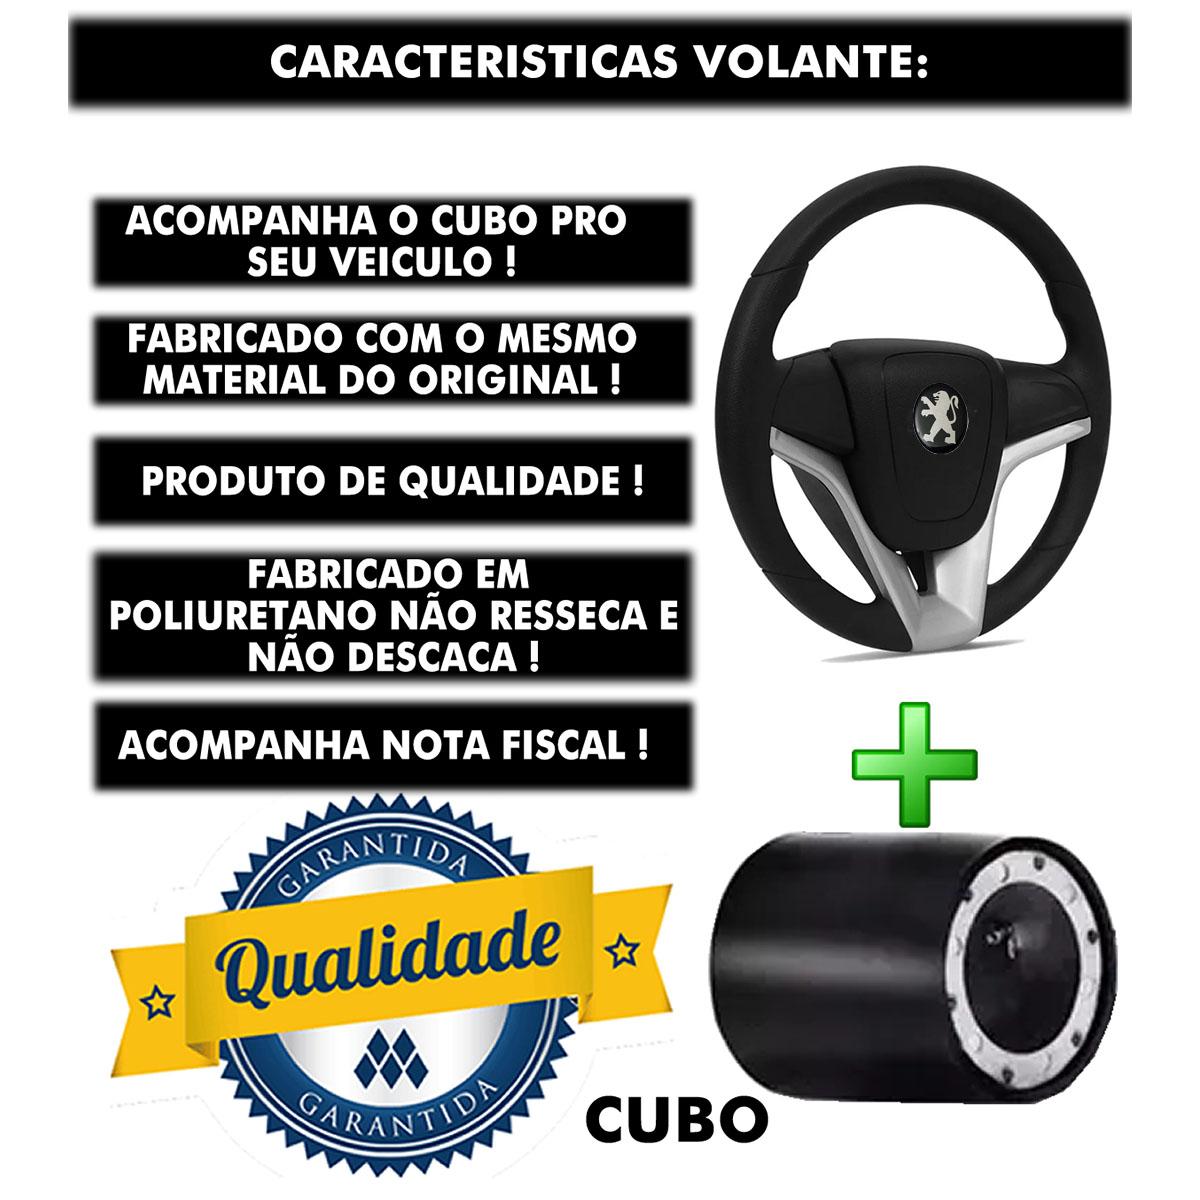 Volante Peugeot Mustang Esportivo Cubo Atacado Poliparts